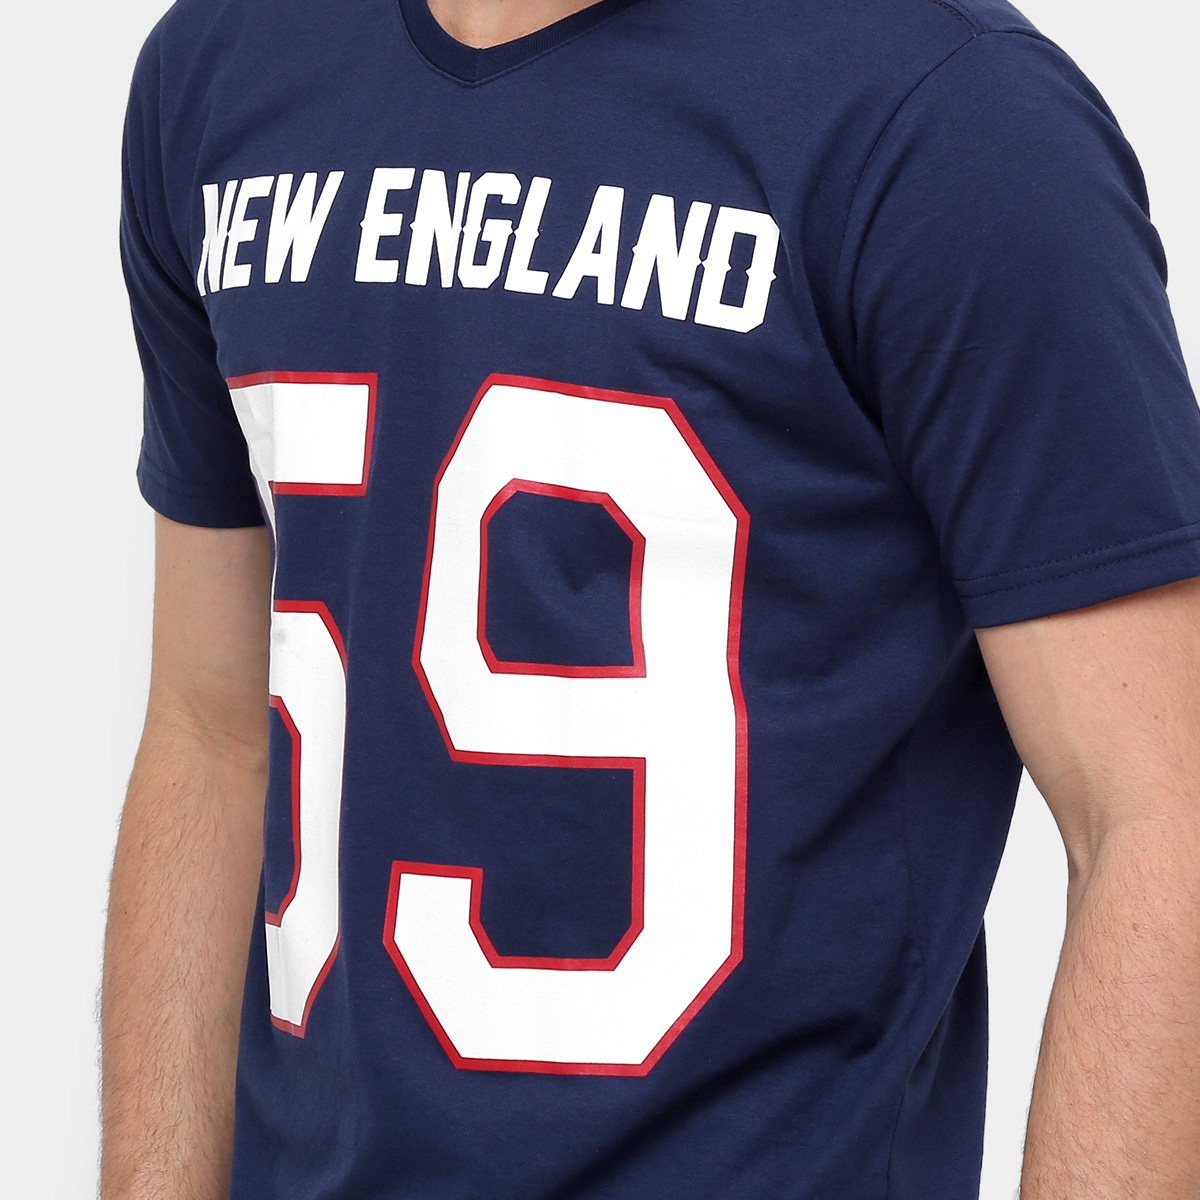 Camisa Futebol Americano New England Gonew Leagues Masculina ... 8928798da4922